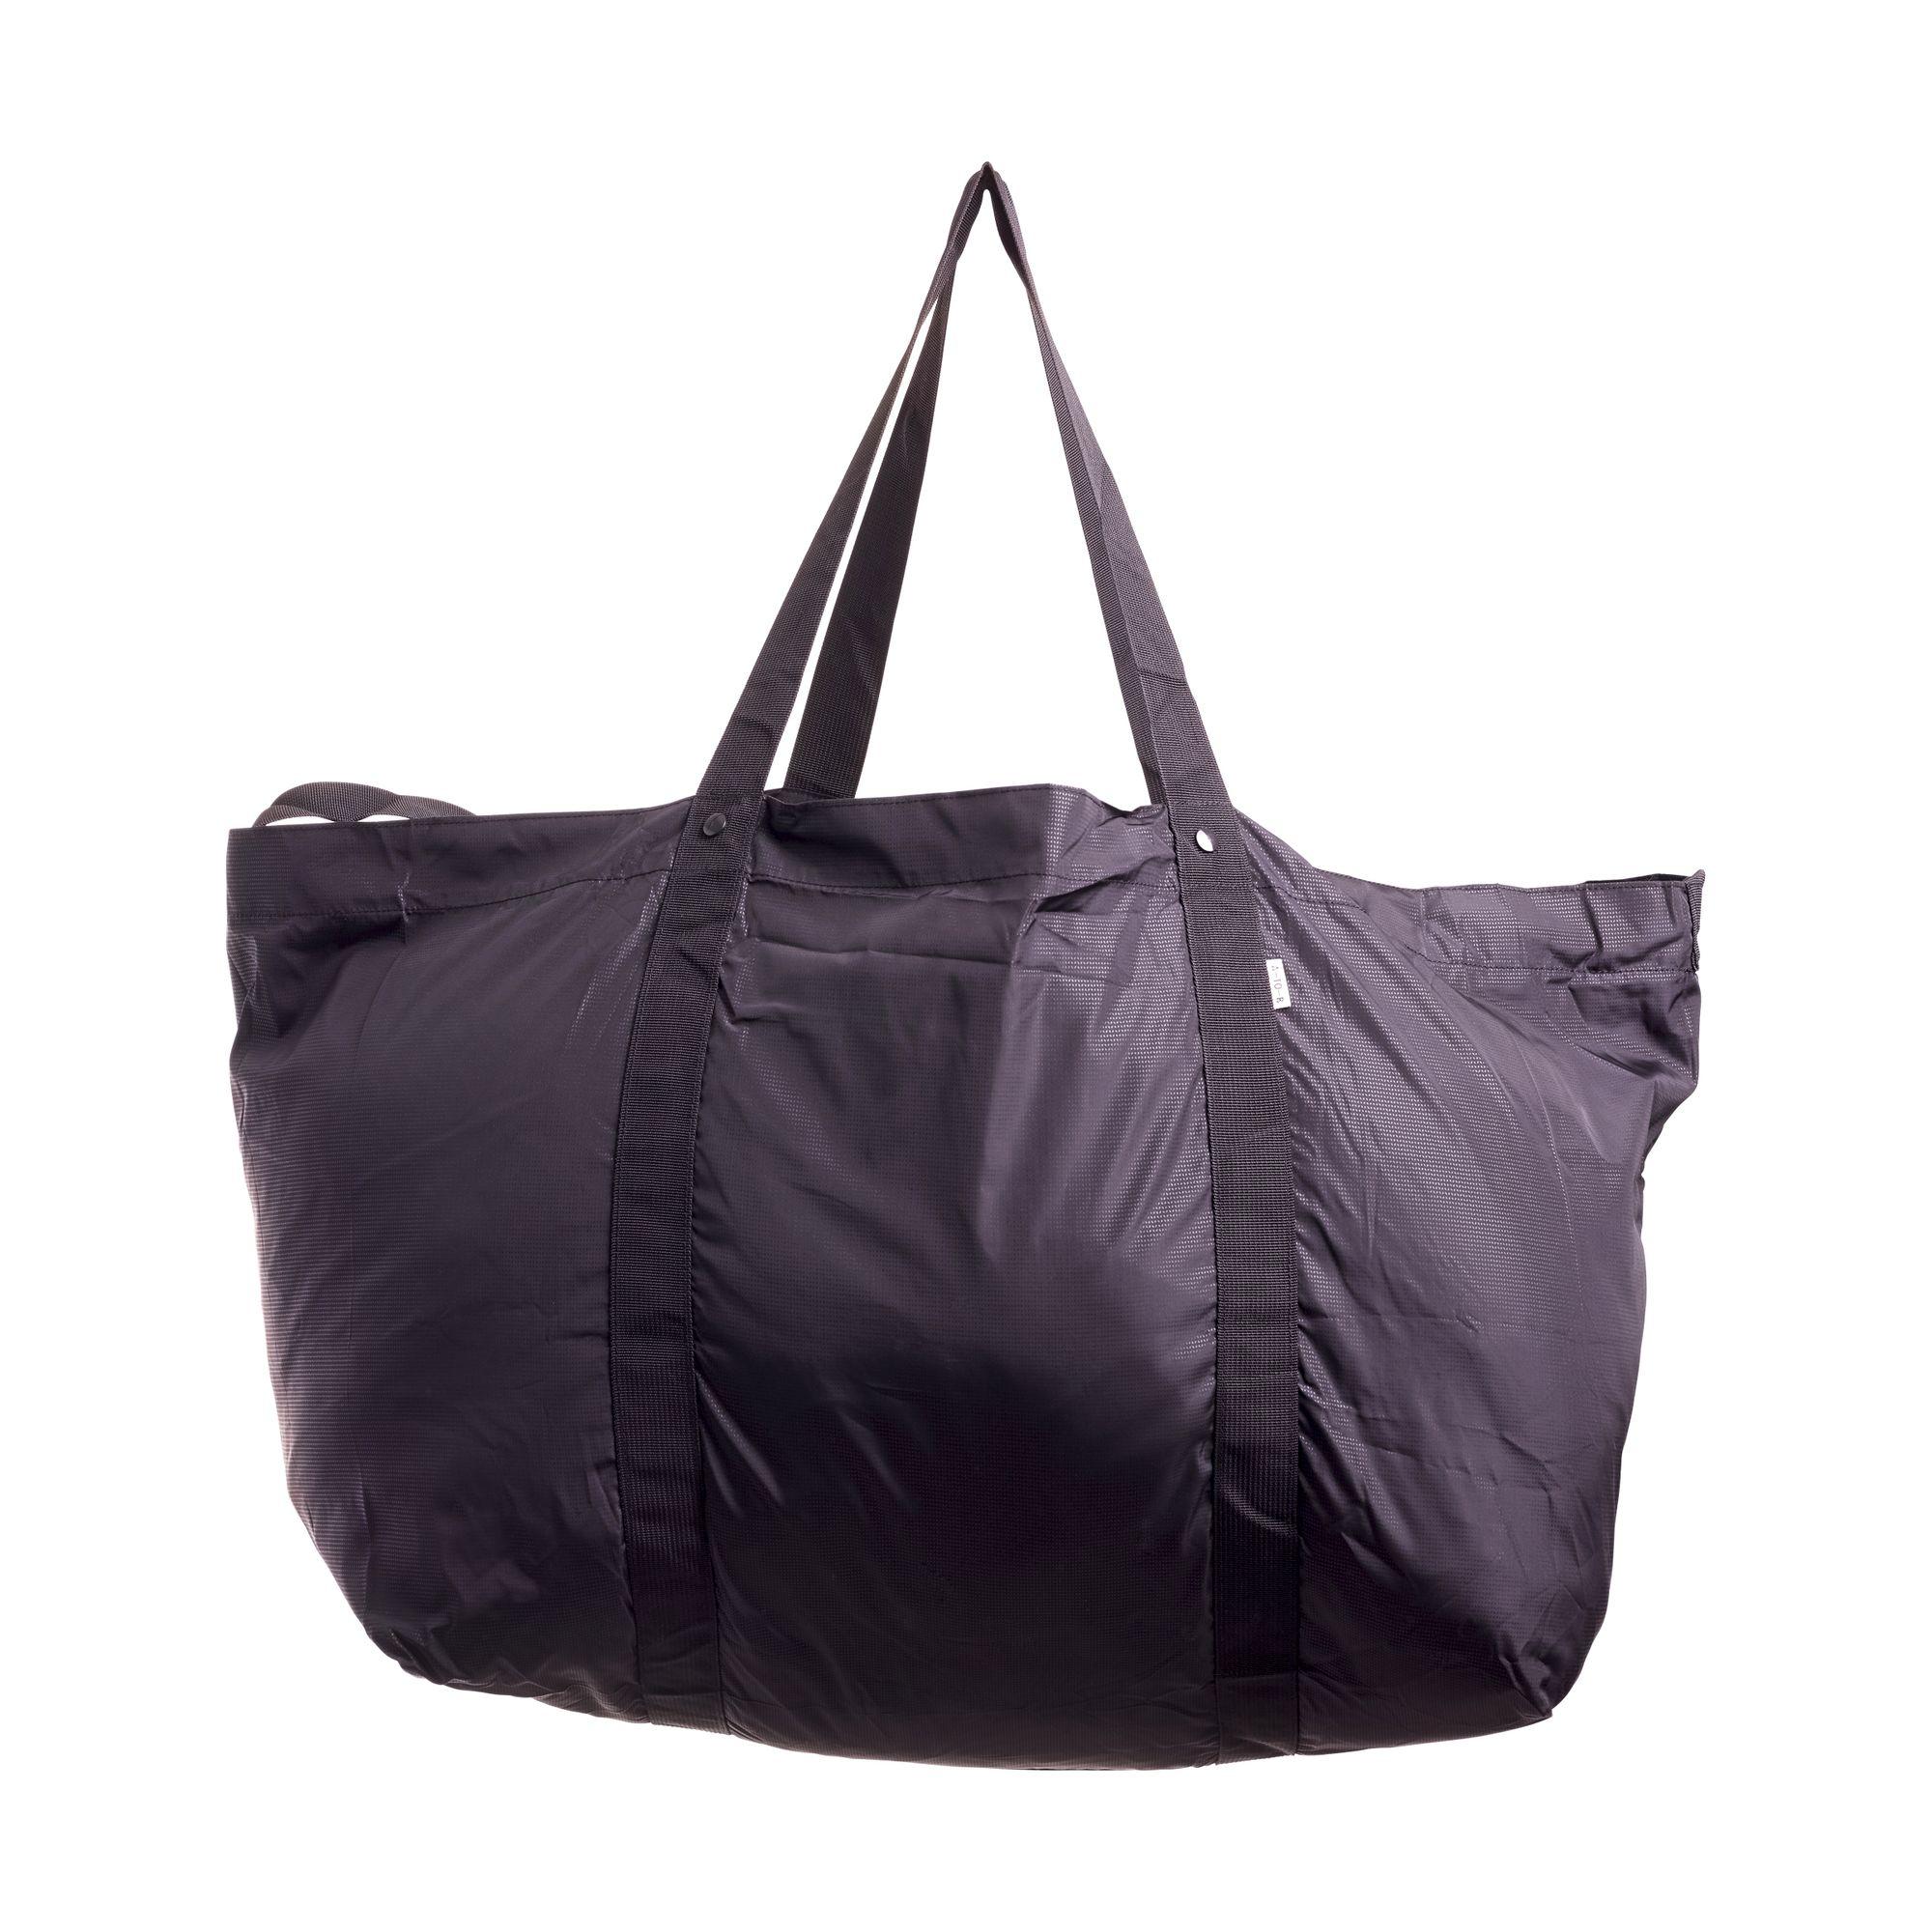 A-TO-B A-TO-B hopfällbar väska 74f41af8a1d5d